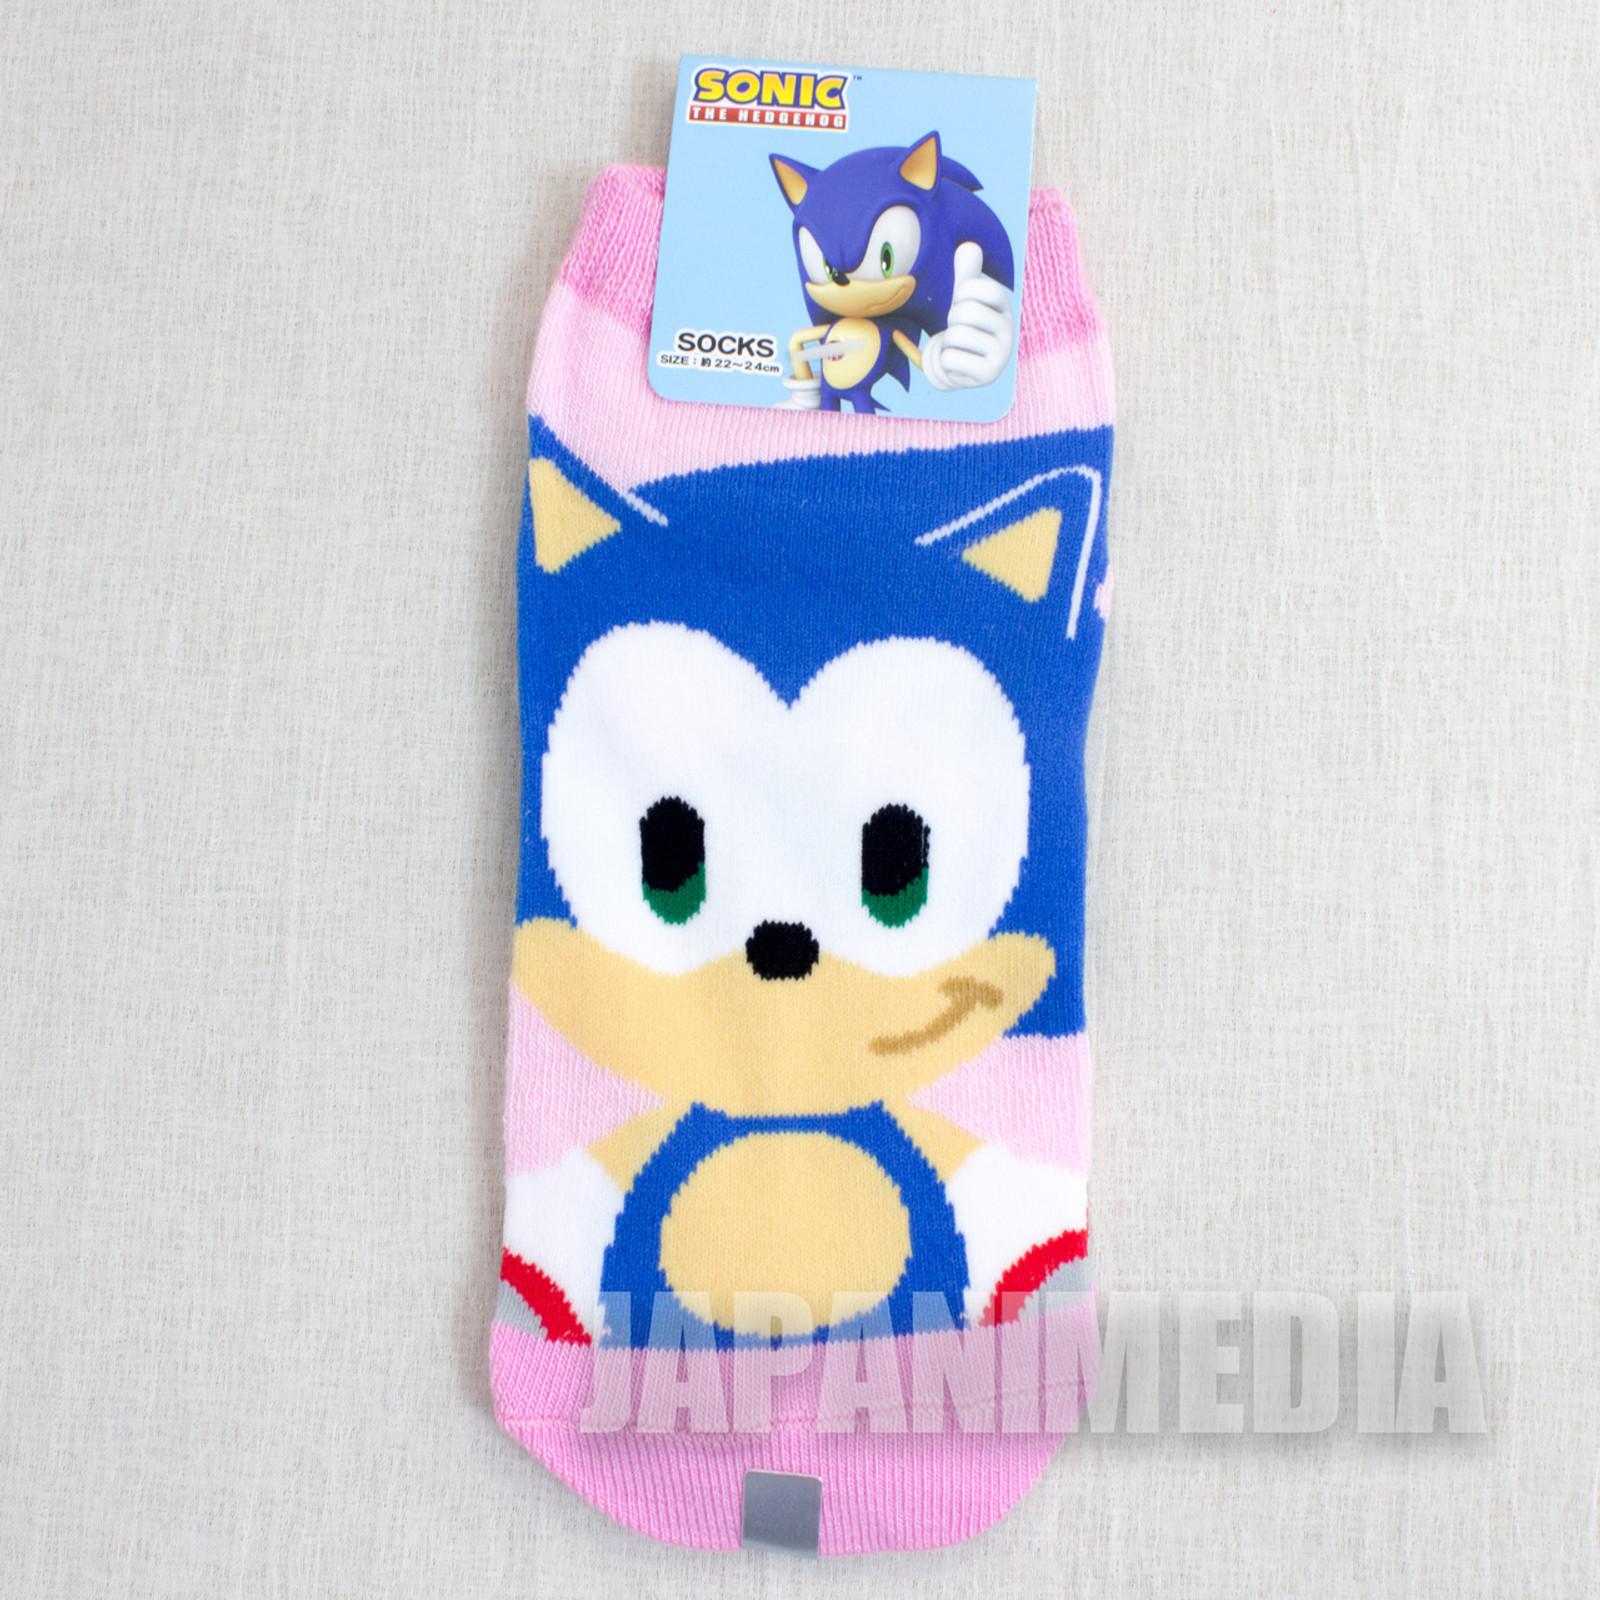 Sonic The Hedgehog #1 a Pair of Socks Size 22-24cm JAPAN ANIME MANGA